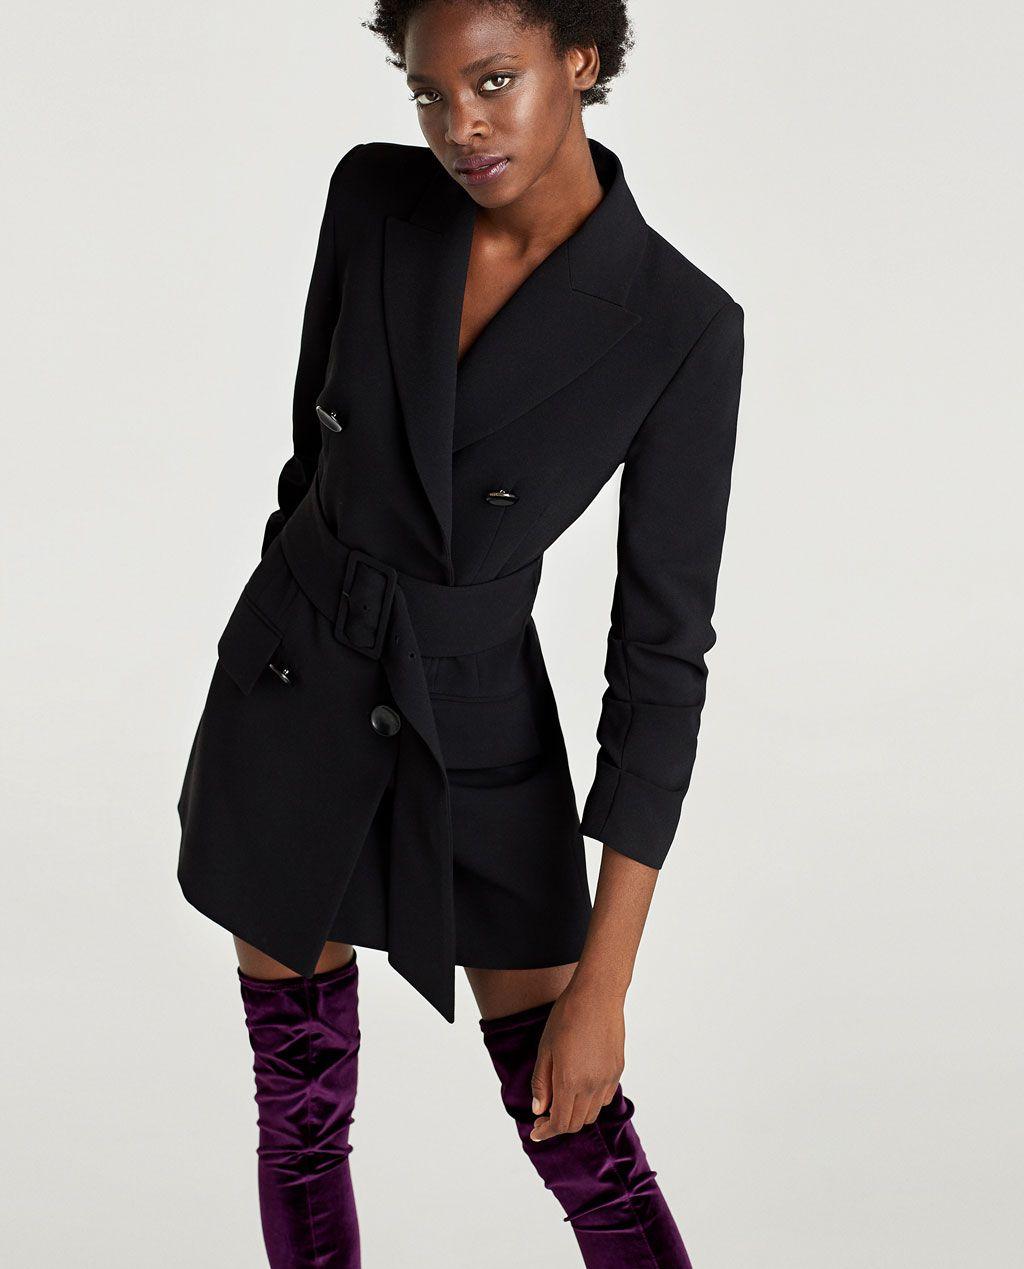 image 2 of checked dress blazer from zara dress pinterest blazers autumn and winter. Black Bedroom Furniture Sets. Home Design Ideas